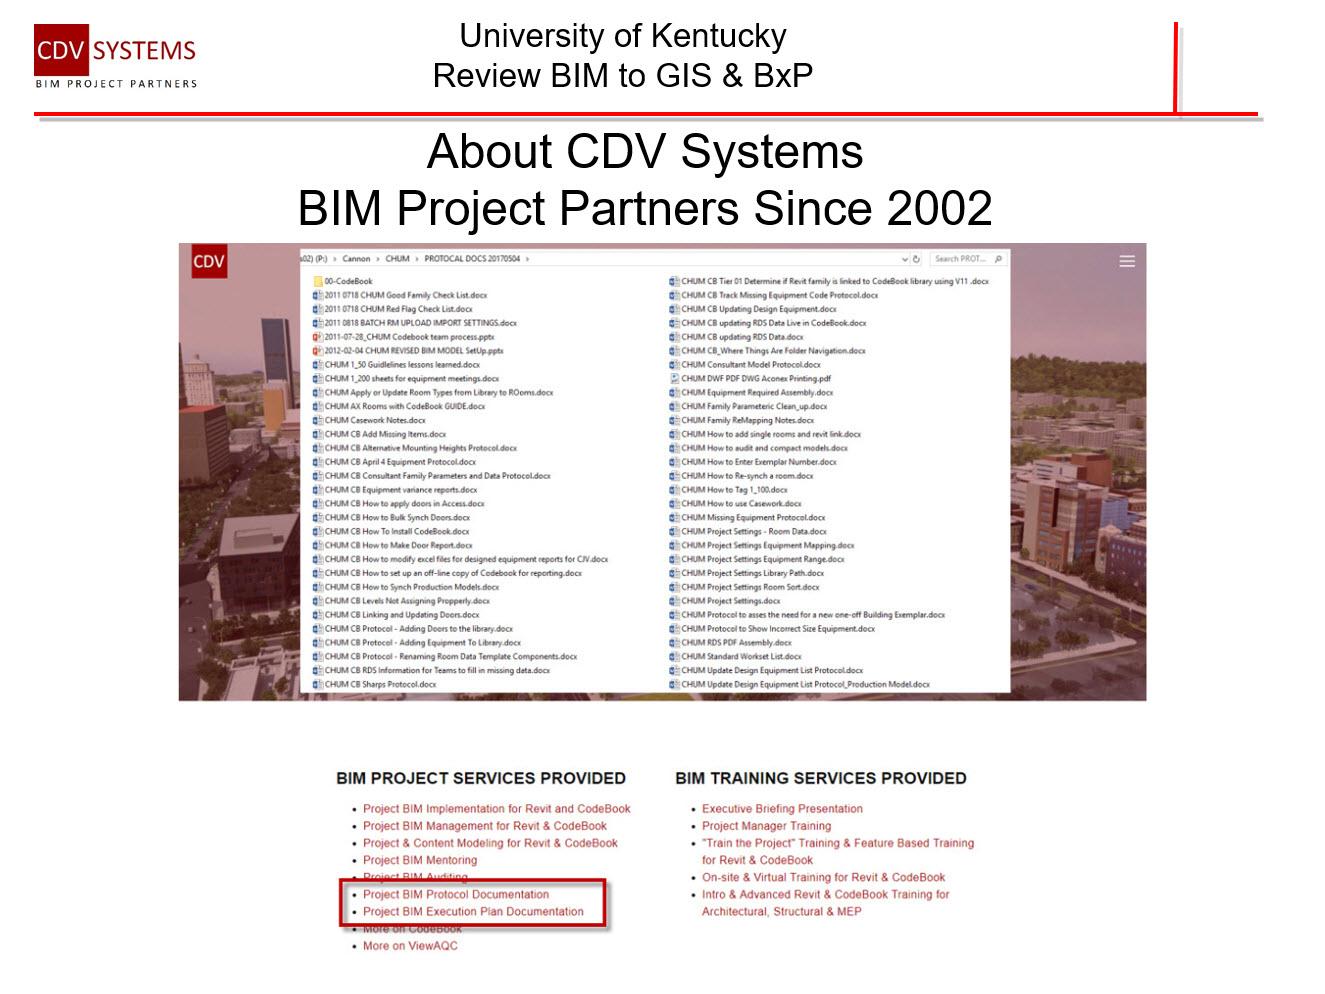 University of Kentucky_001p.jpg